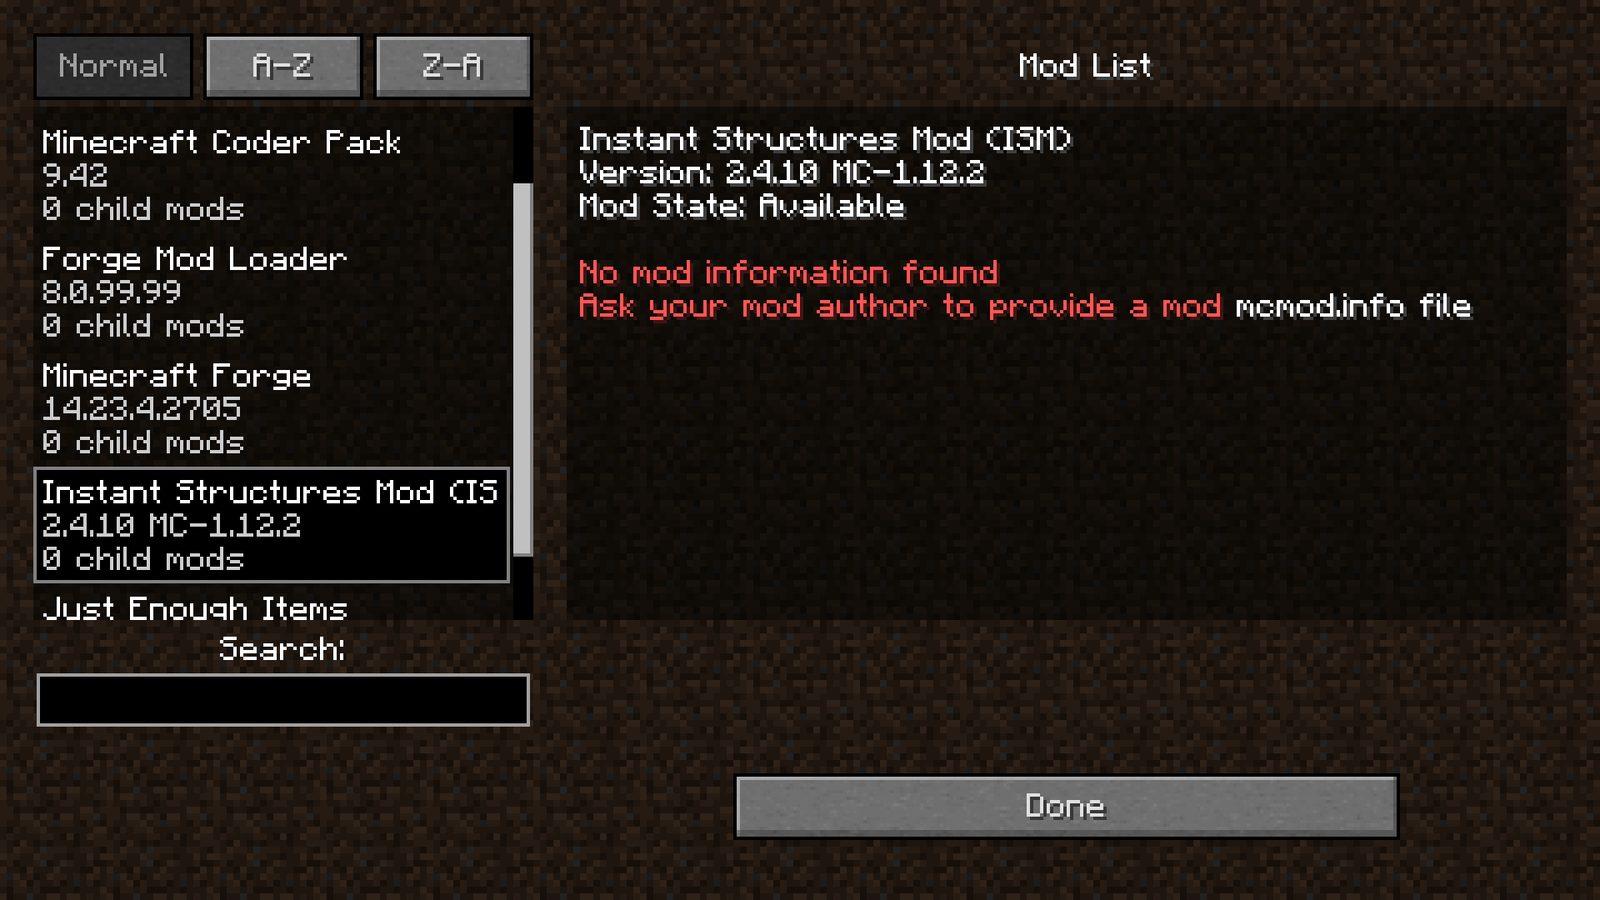 Minecraft quick build mod 1.12.2